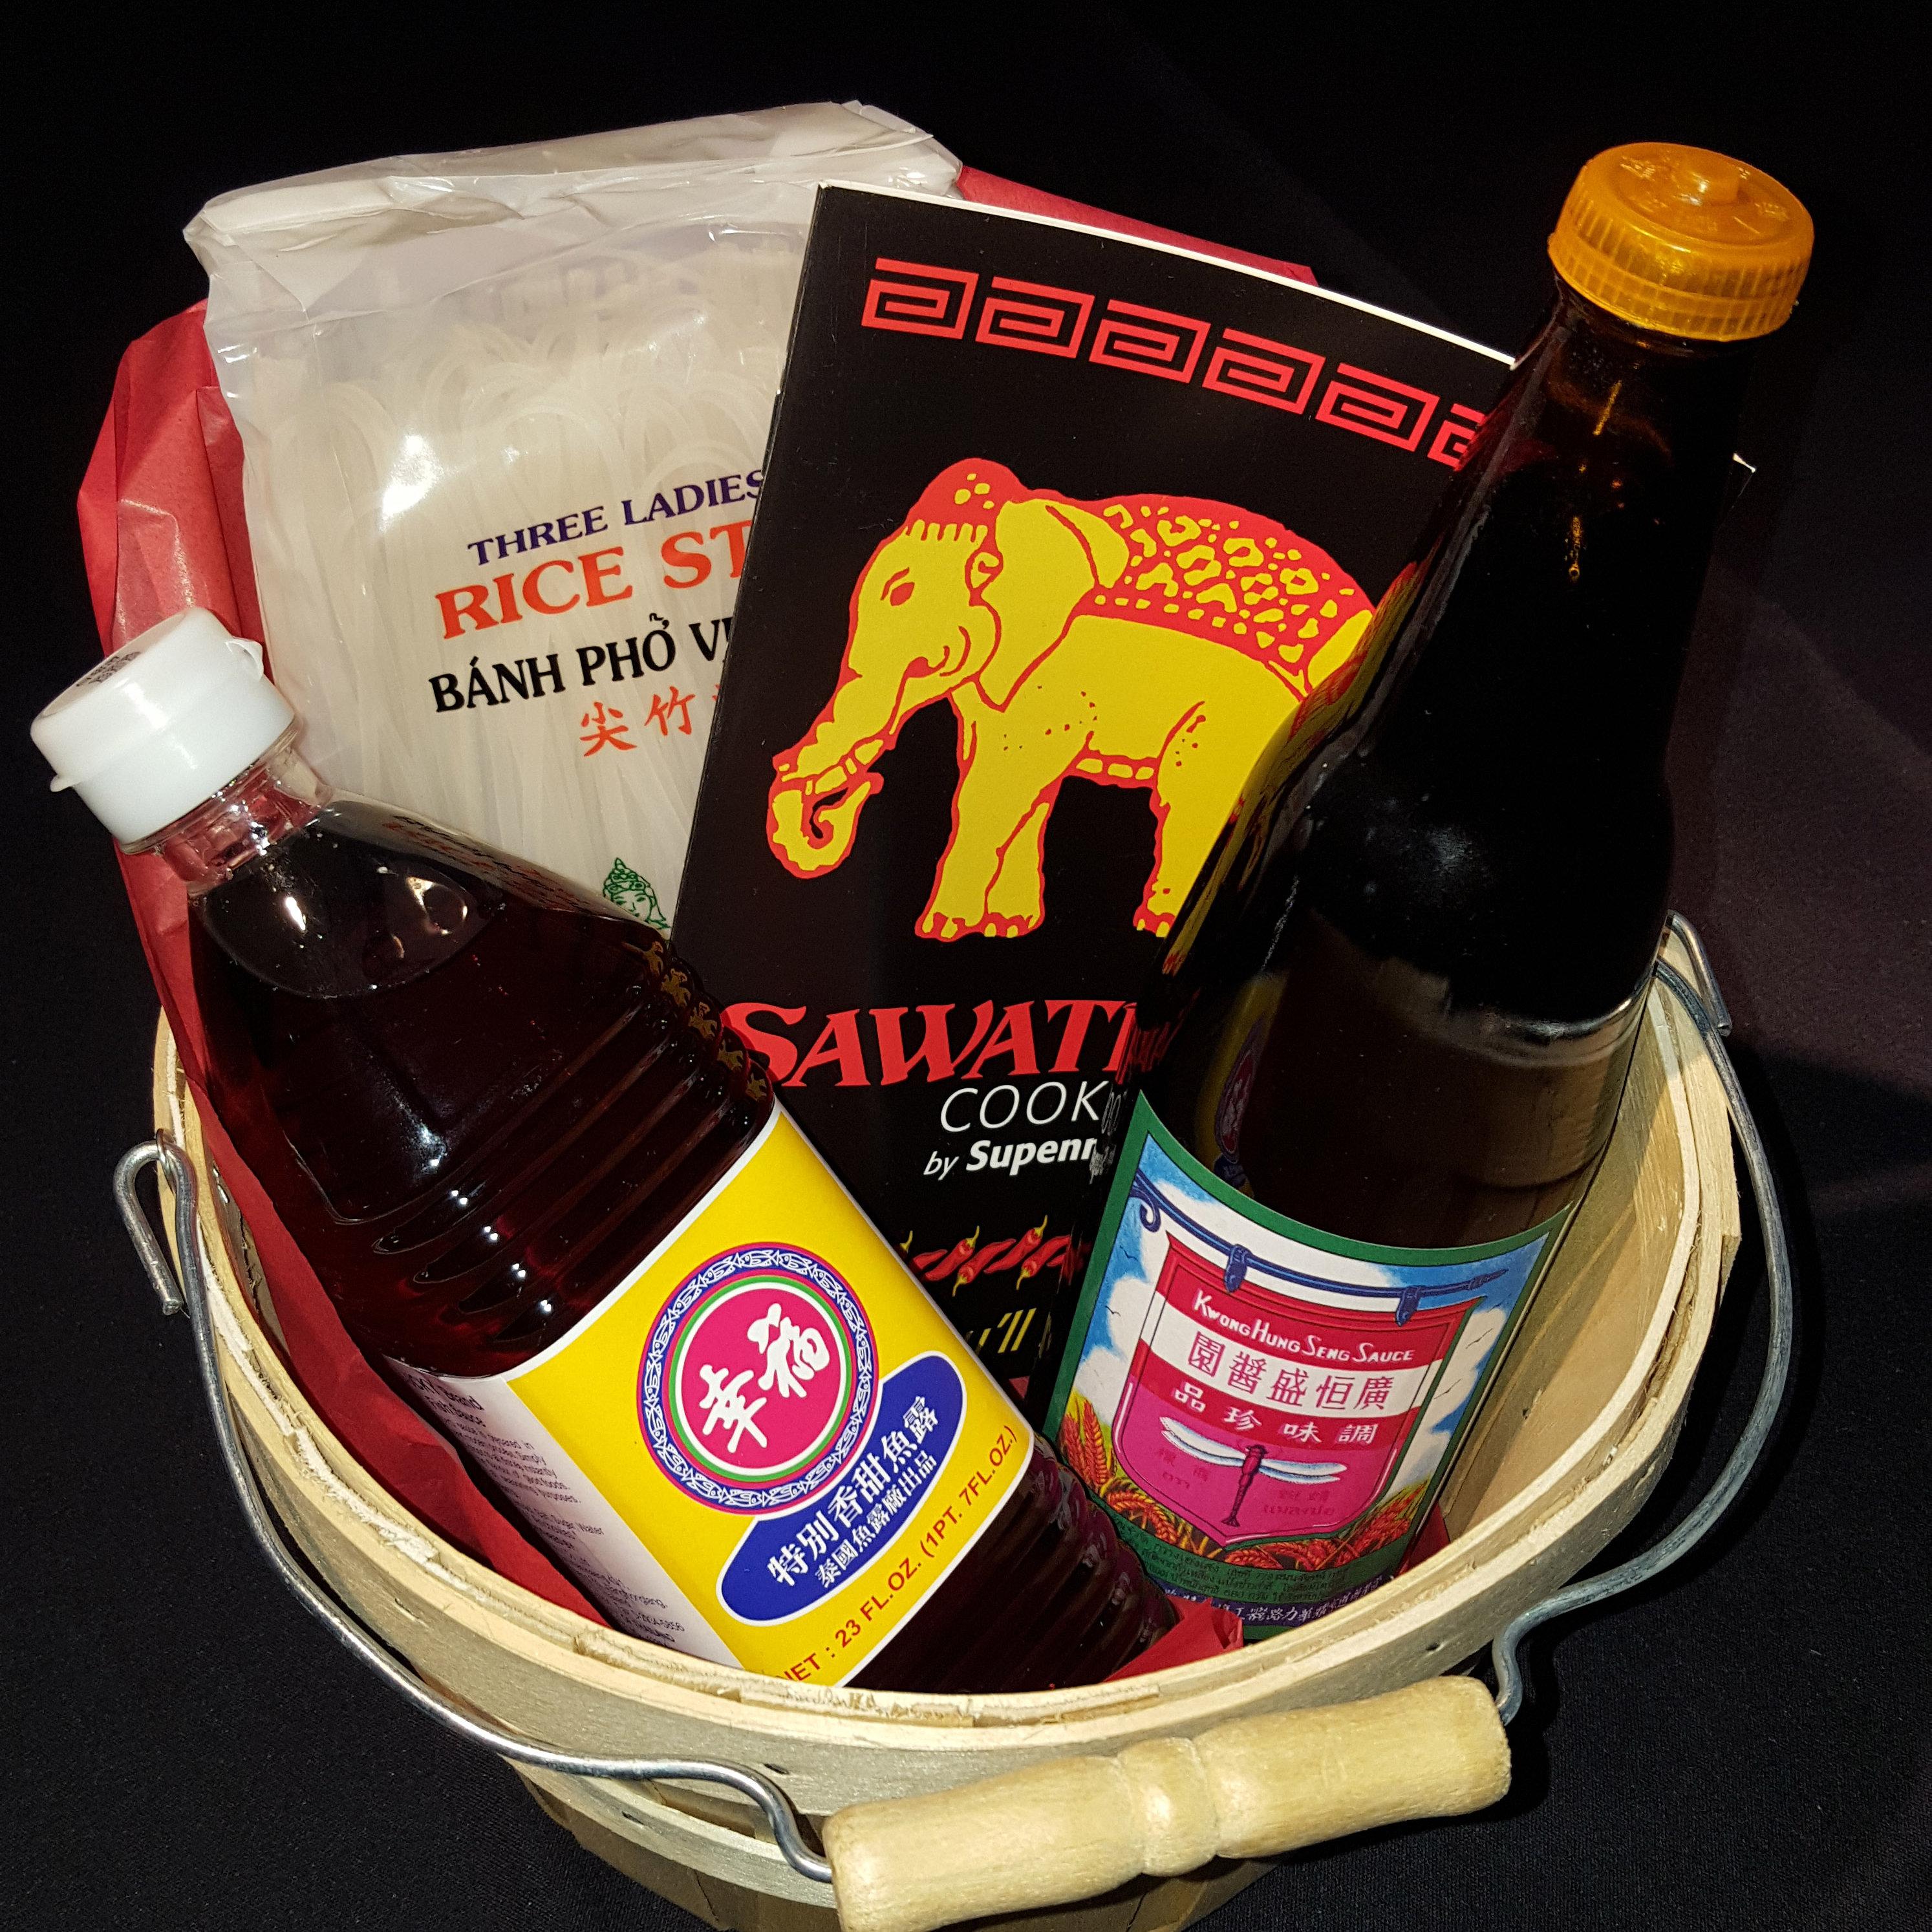 Sawatdee sawatdee gift basket small sawatdee gift basket small 29 taxes included this gluten free negle Gallery